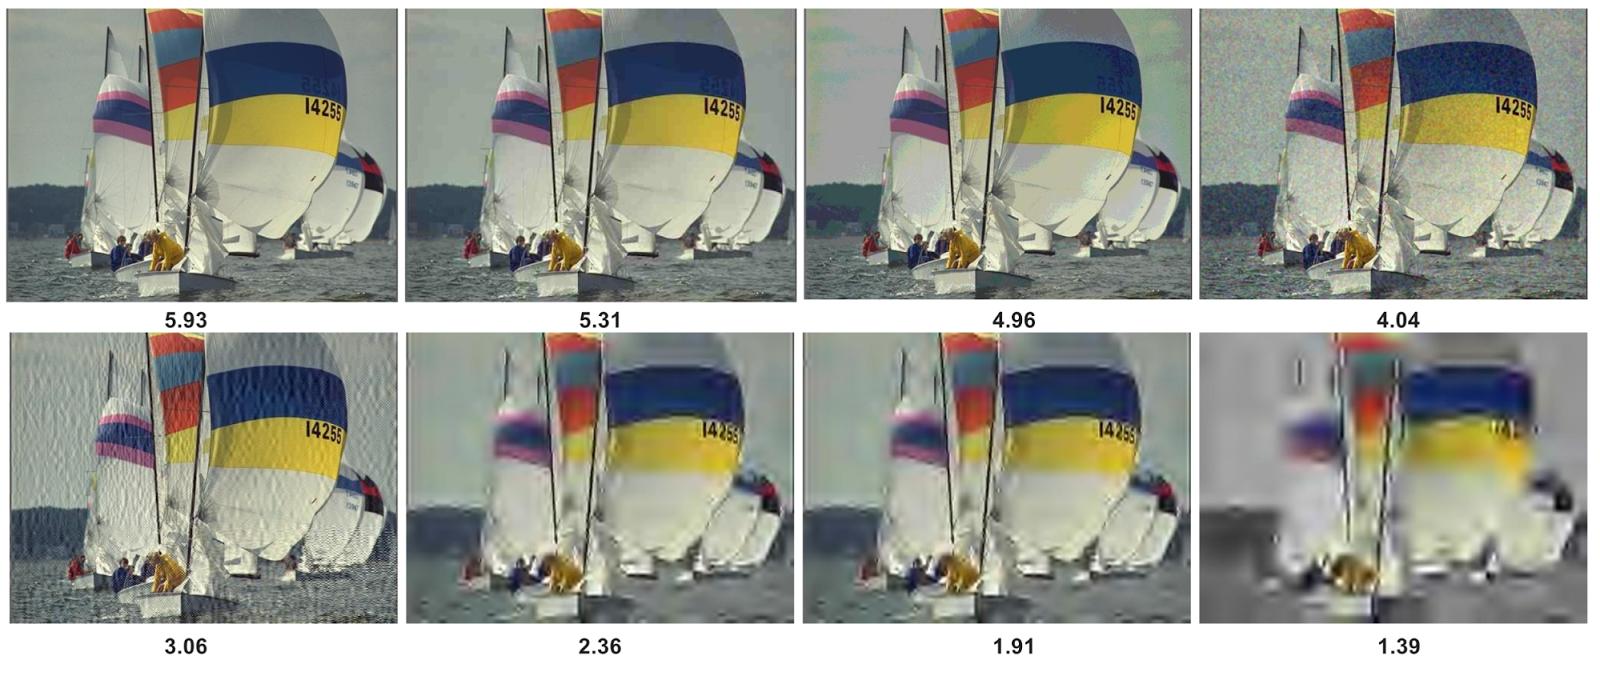 Google AI Blog: Introducing NIMA: Neural Image Assessment